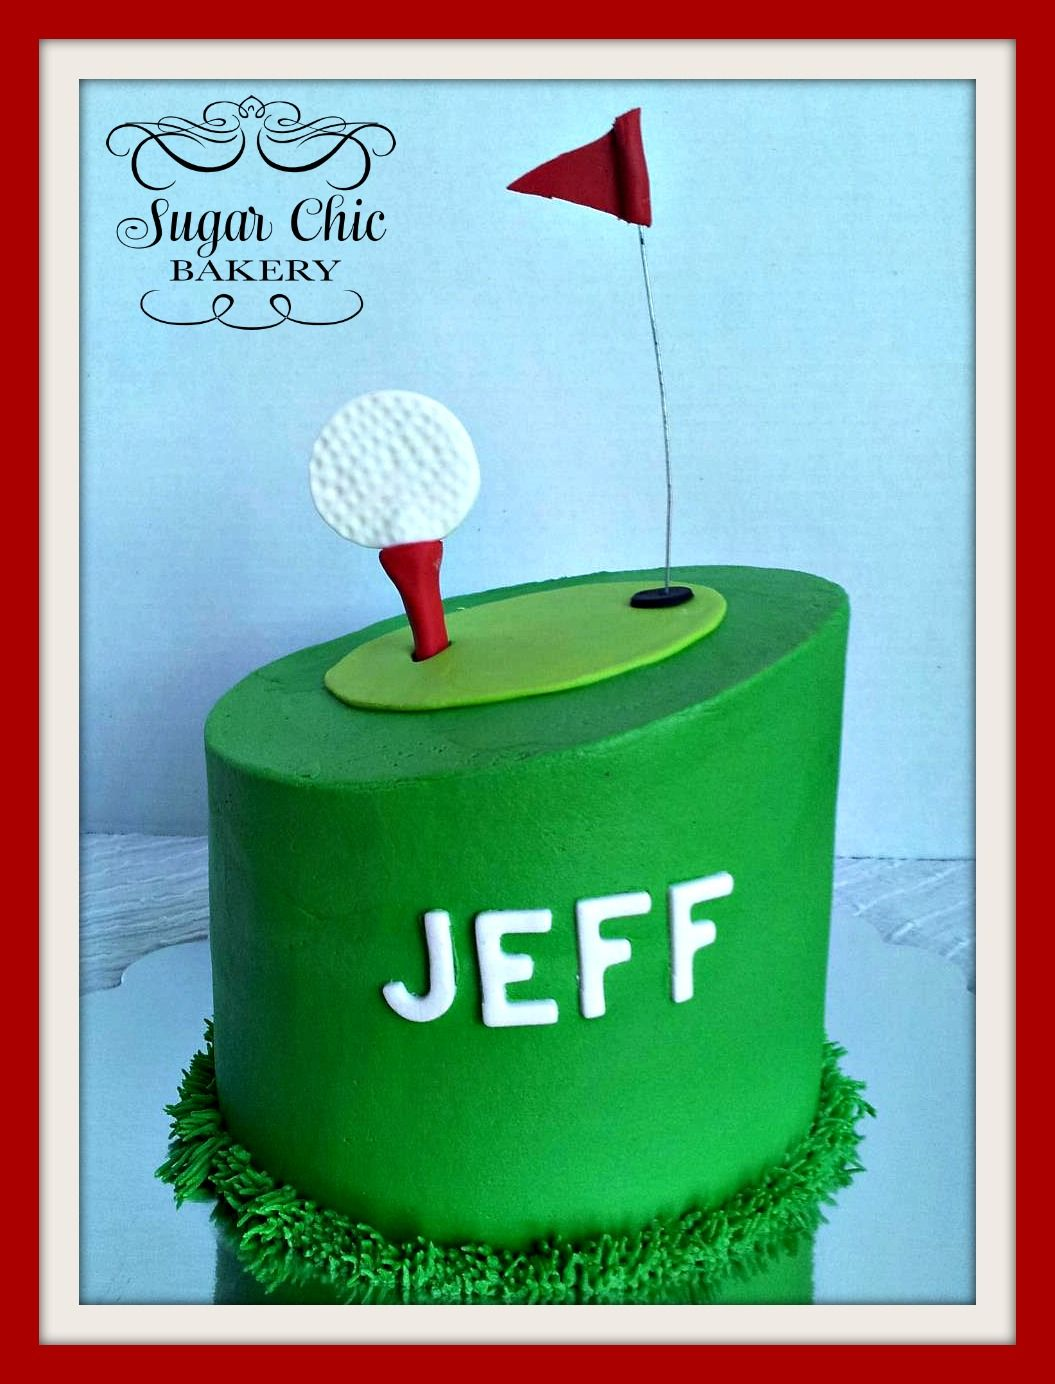 Small Golf cake for Grandpas birthday Needs something extra